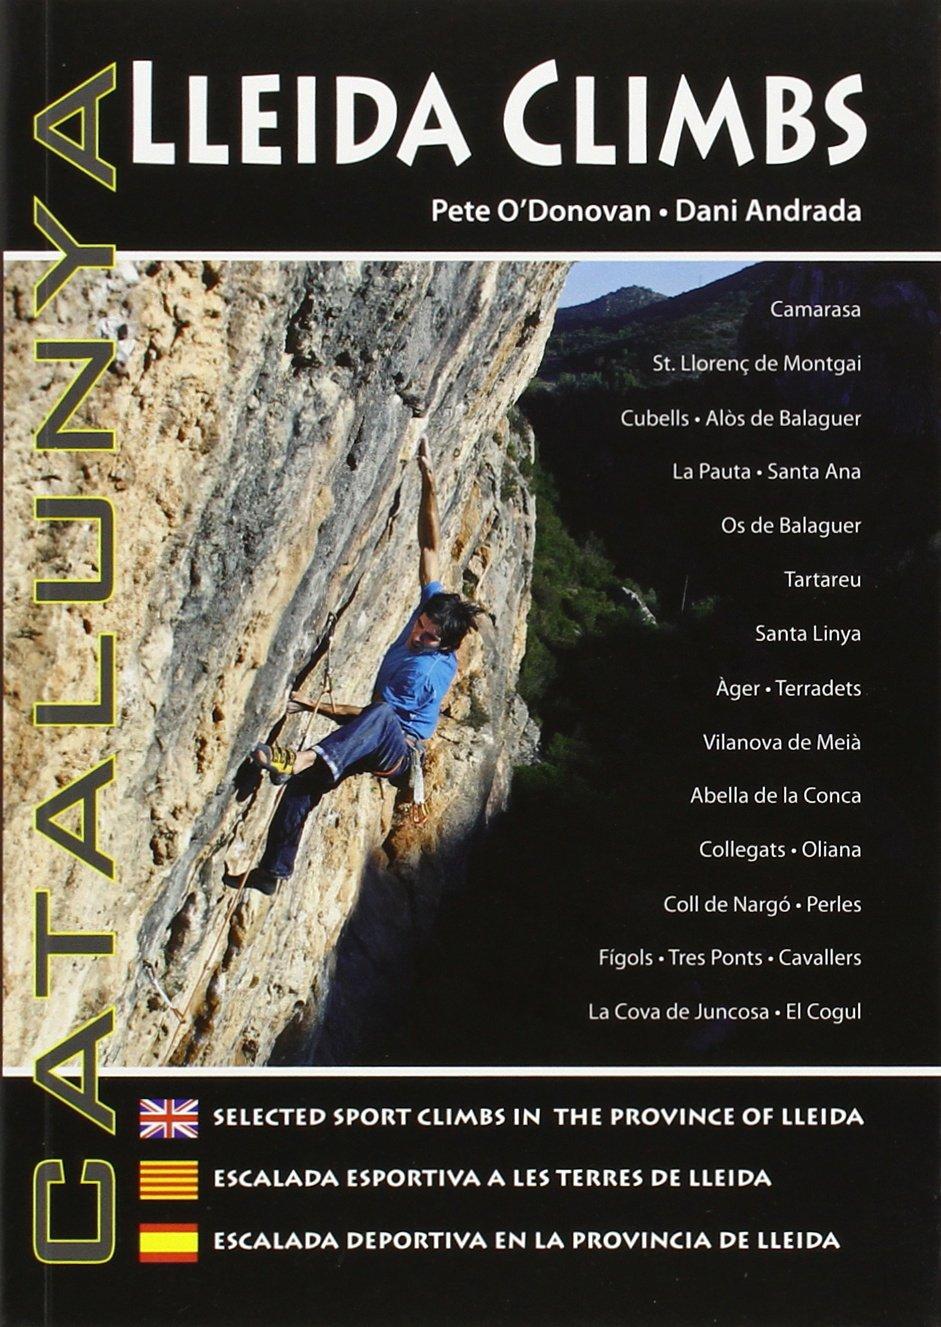 Lleida Climbs - 2ª Edition: Amazon.es: Odonovan, Pete: Libros